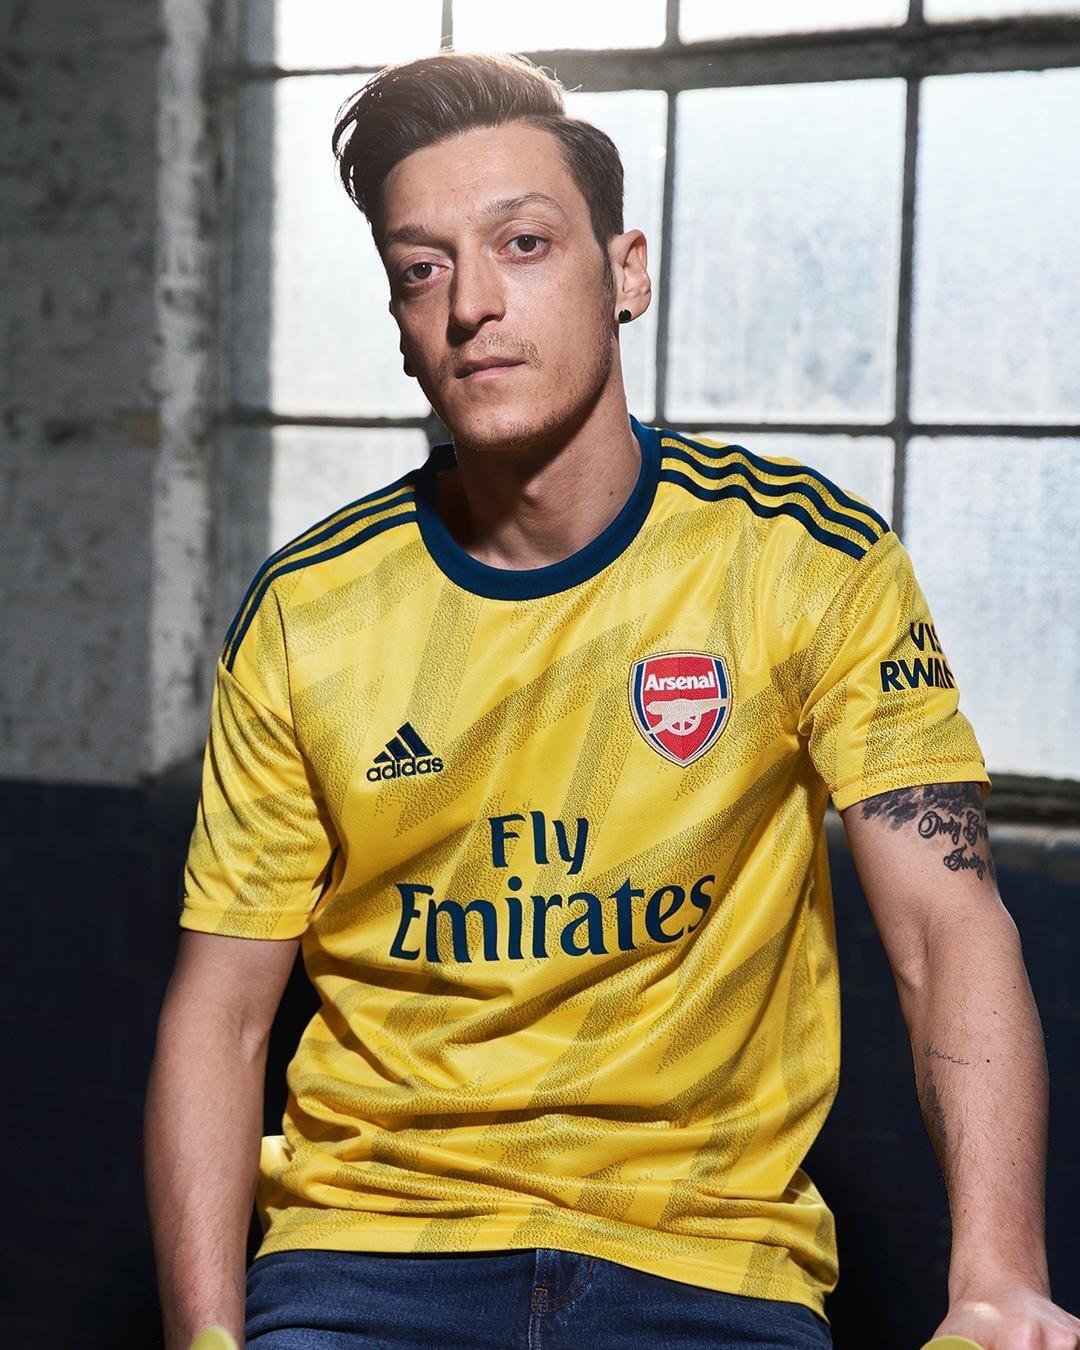 Adidas Arsenal Away Kit 2019-20 Unveiled